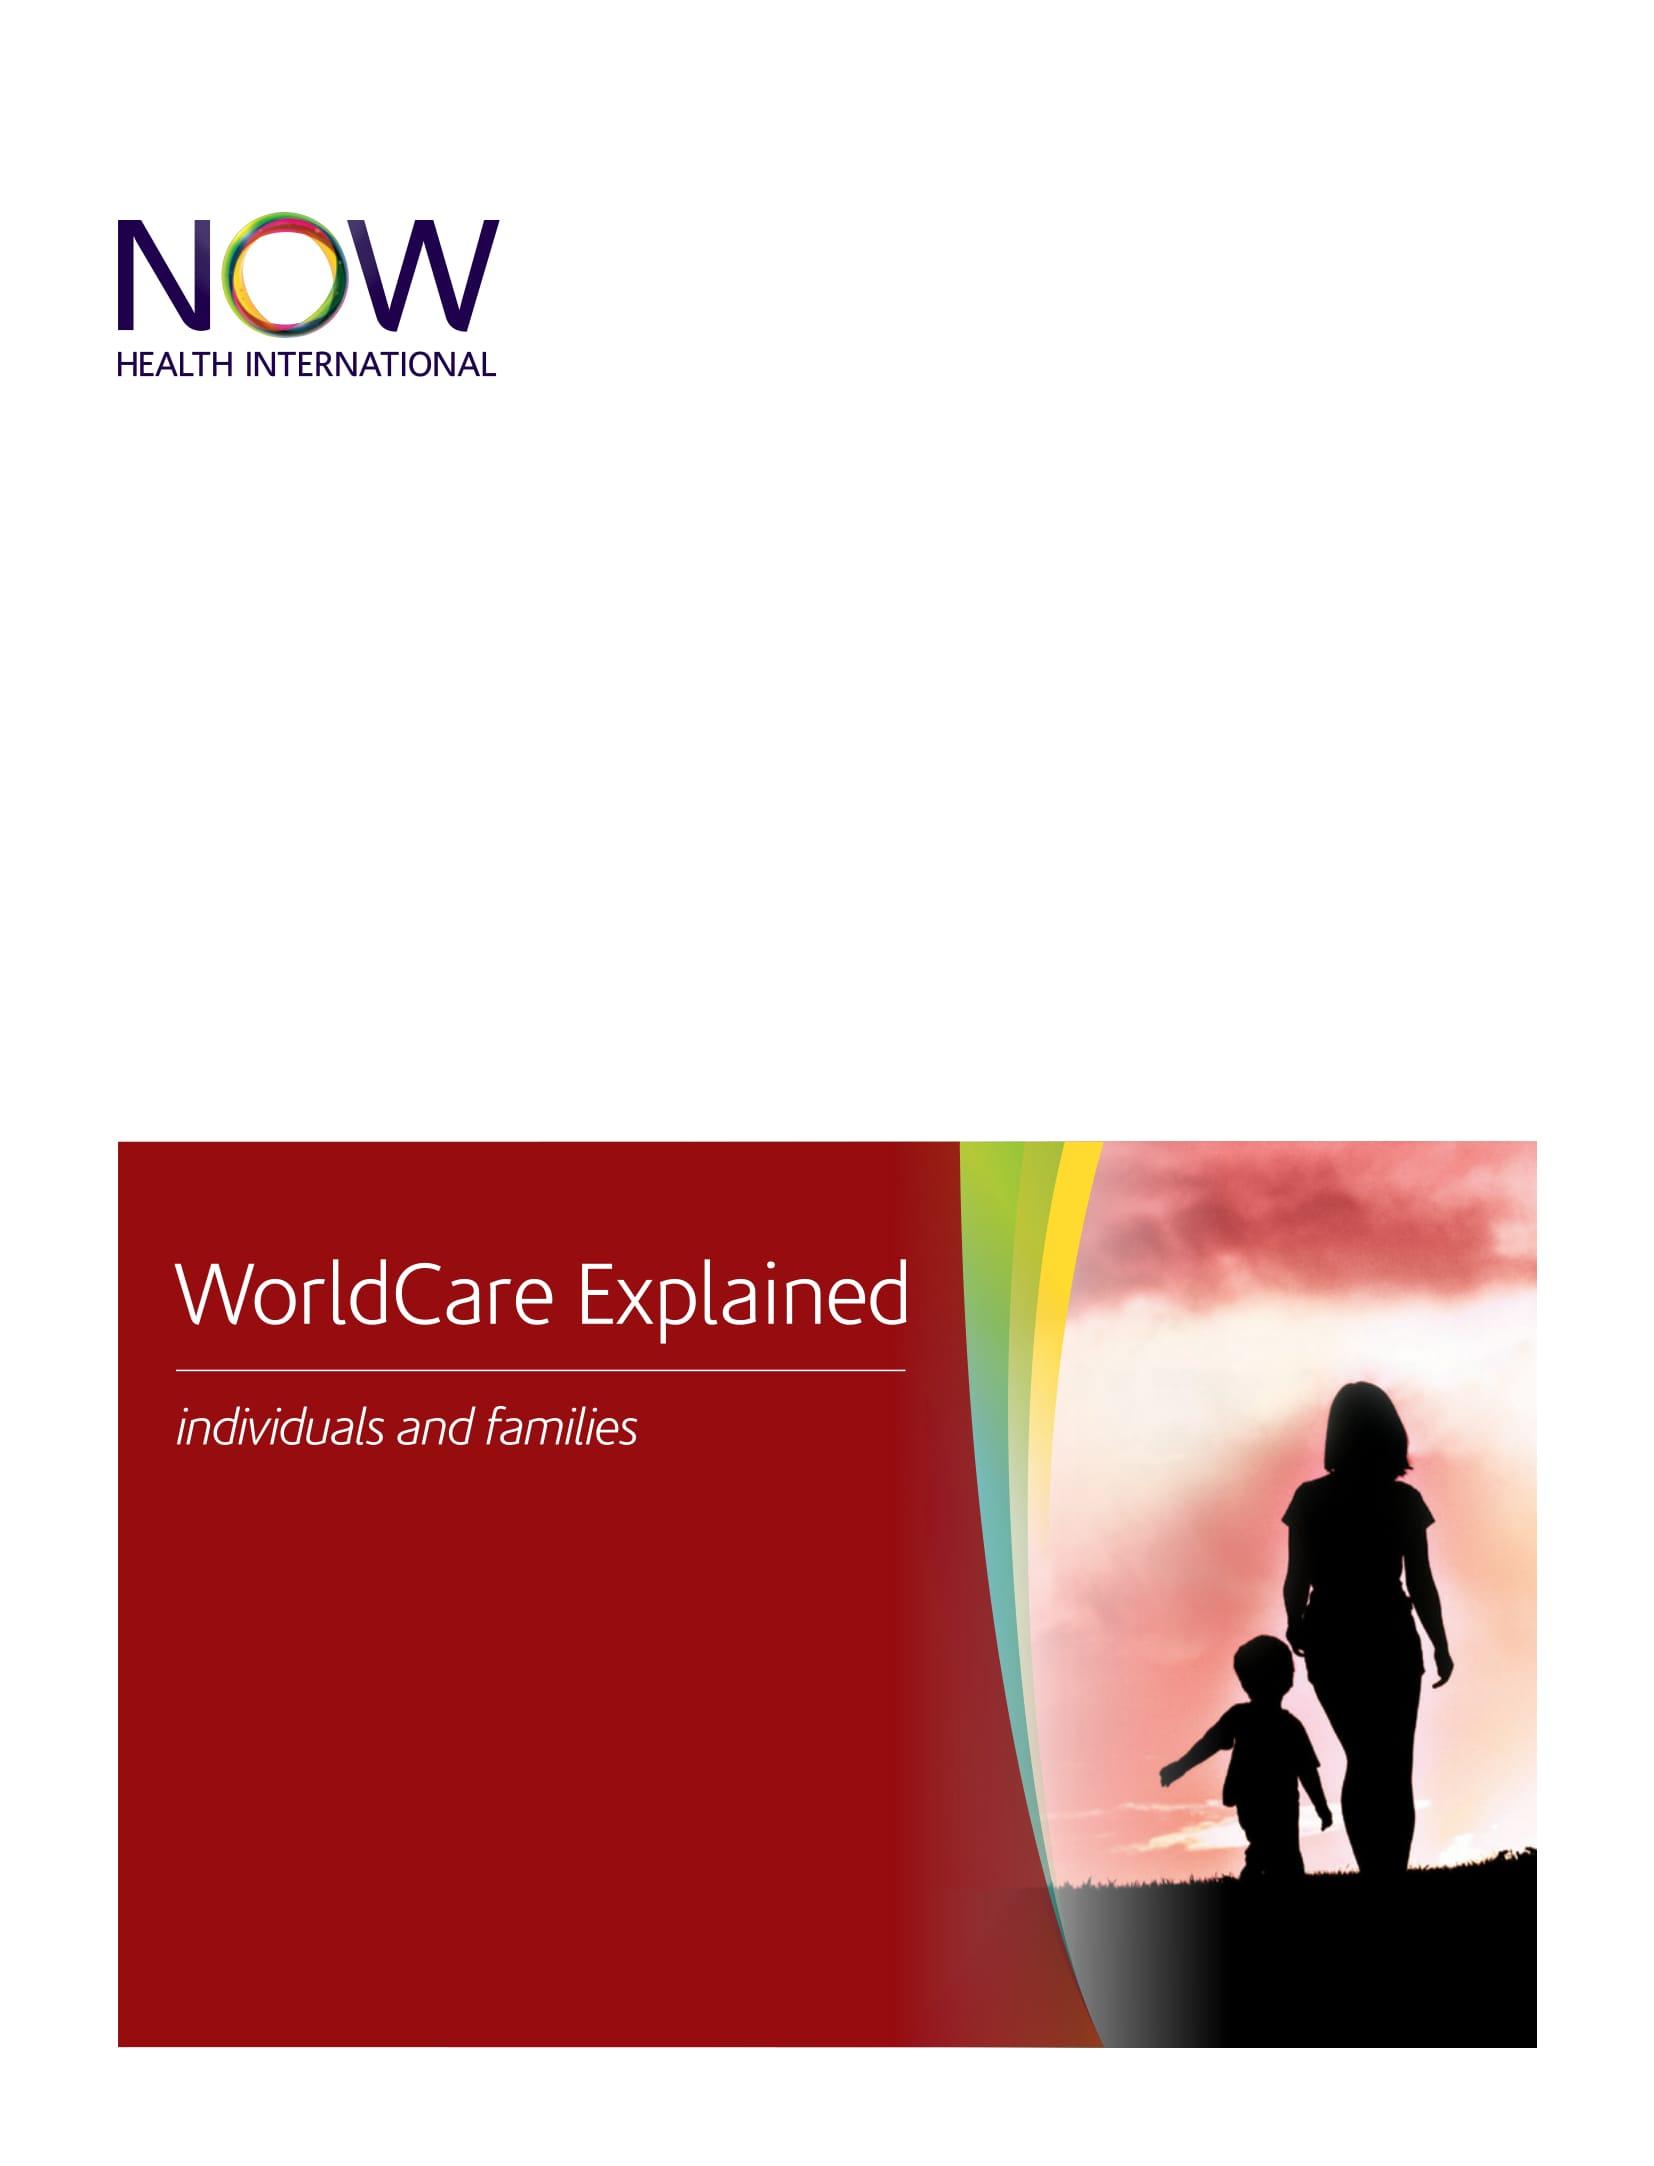 NOW_Proposition Brochure_Europe_Individuals & families_2014-01-29_Rev07 edit 5 Feb 2014-01.jpg